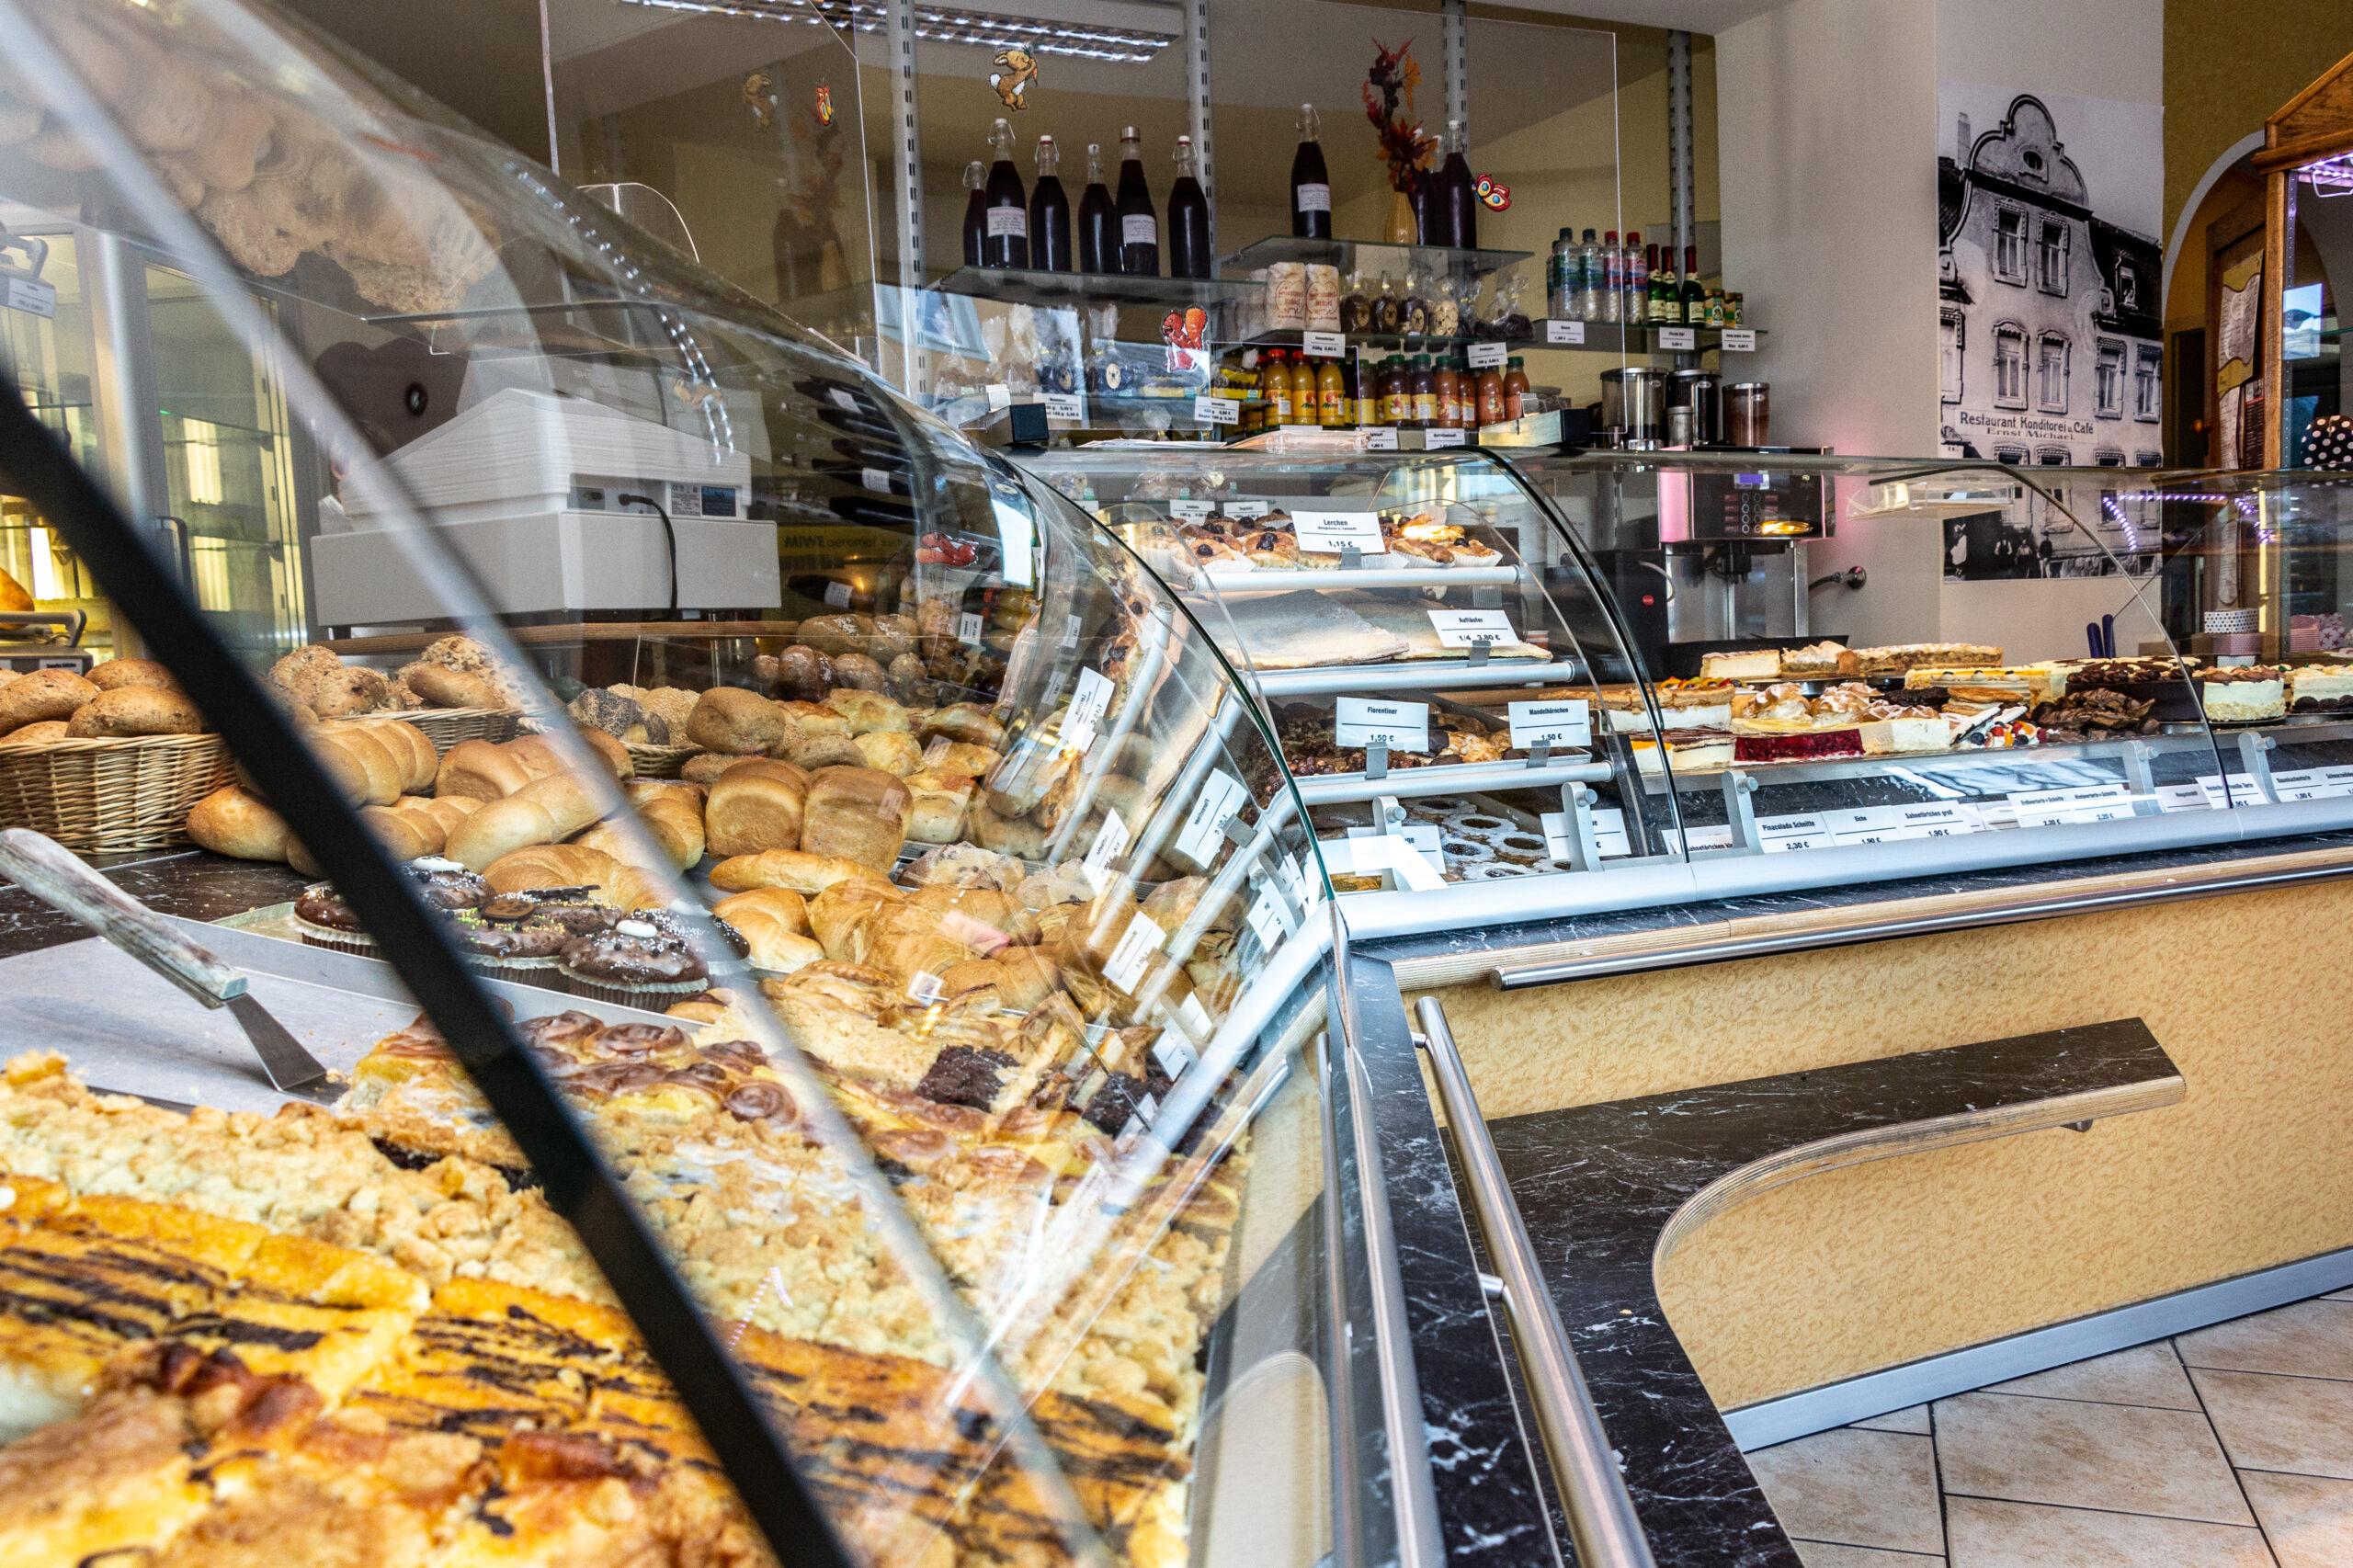 Conditorei & Café Bösewetter - Theke